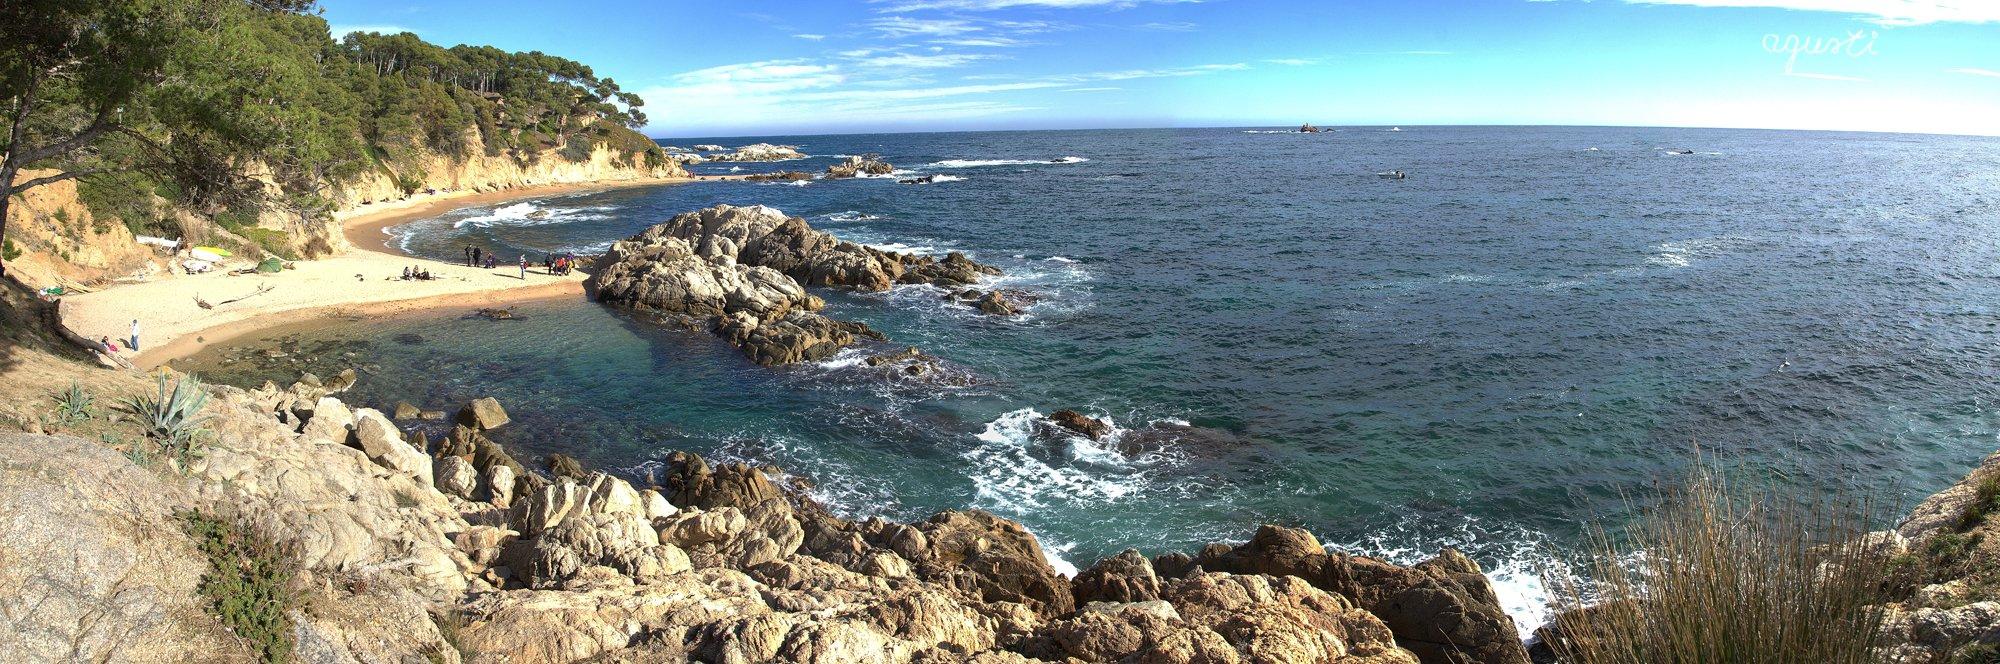 Panoramica Cala Estreta - Palamos